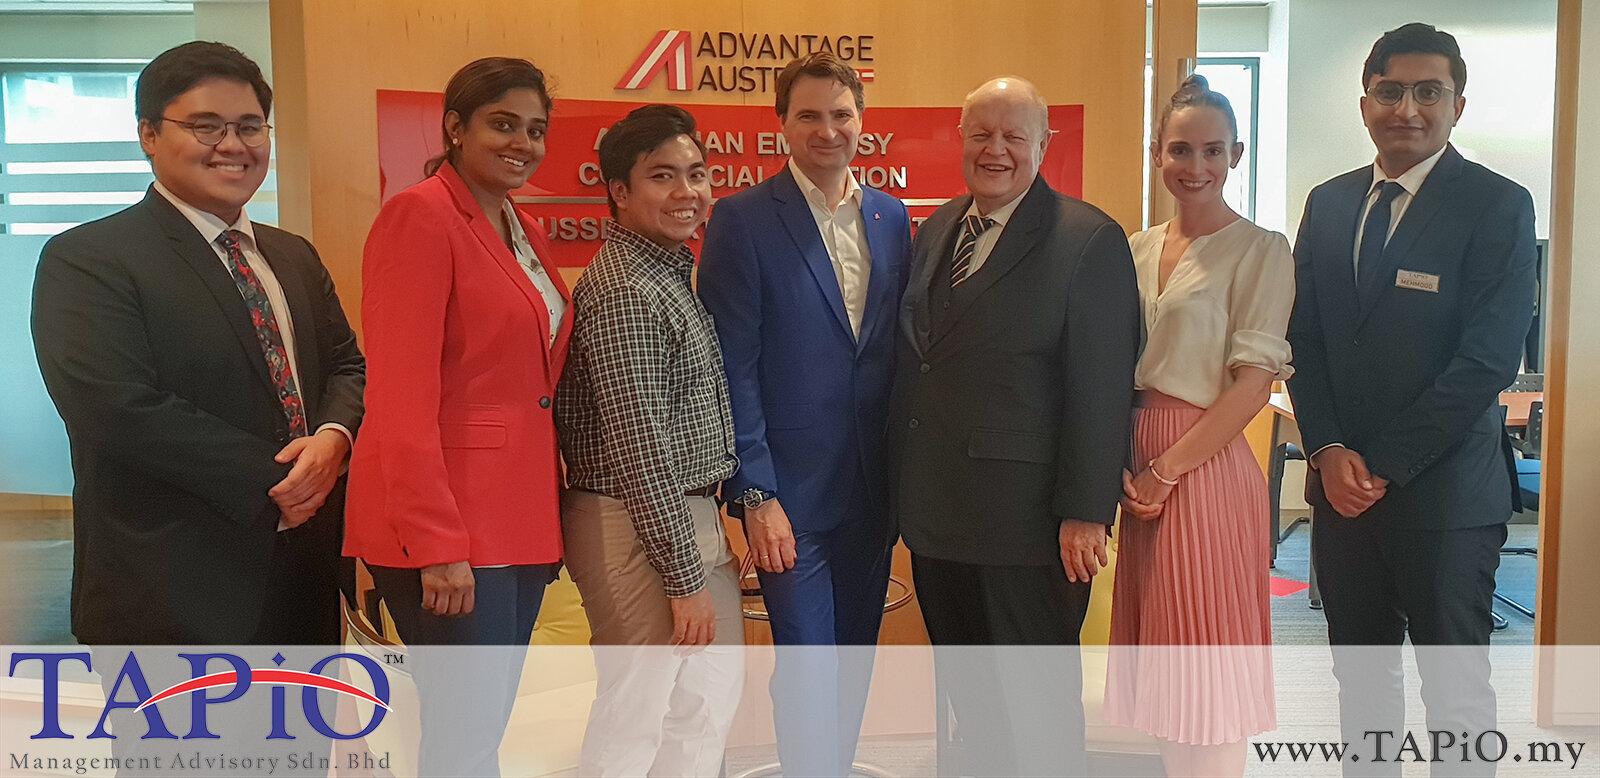 20200212 - Meeting with Advantage Austria